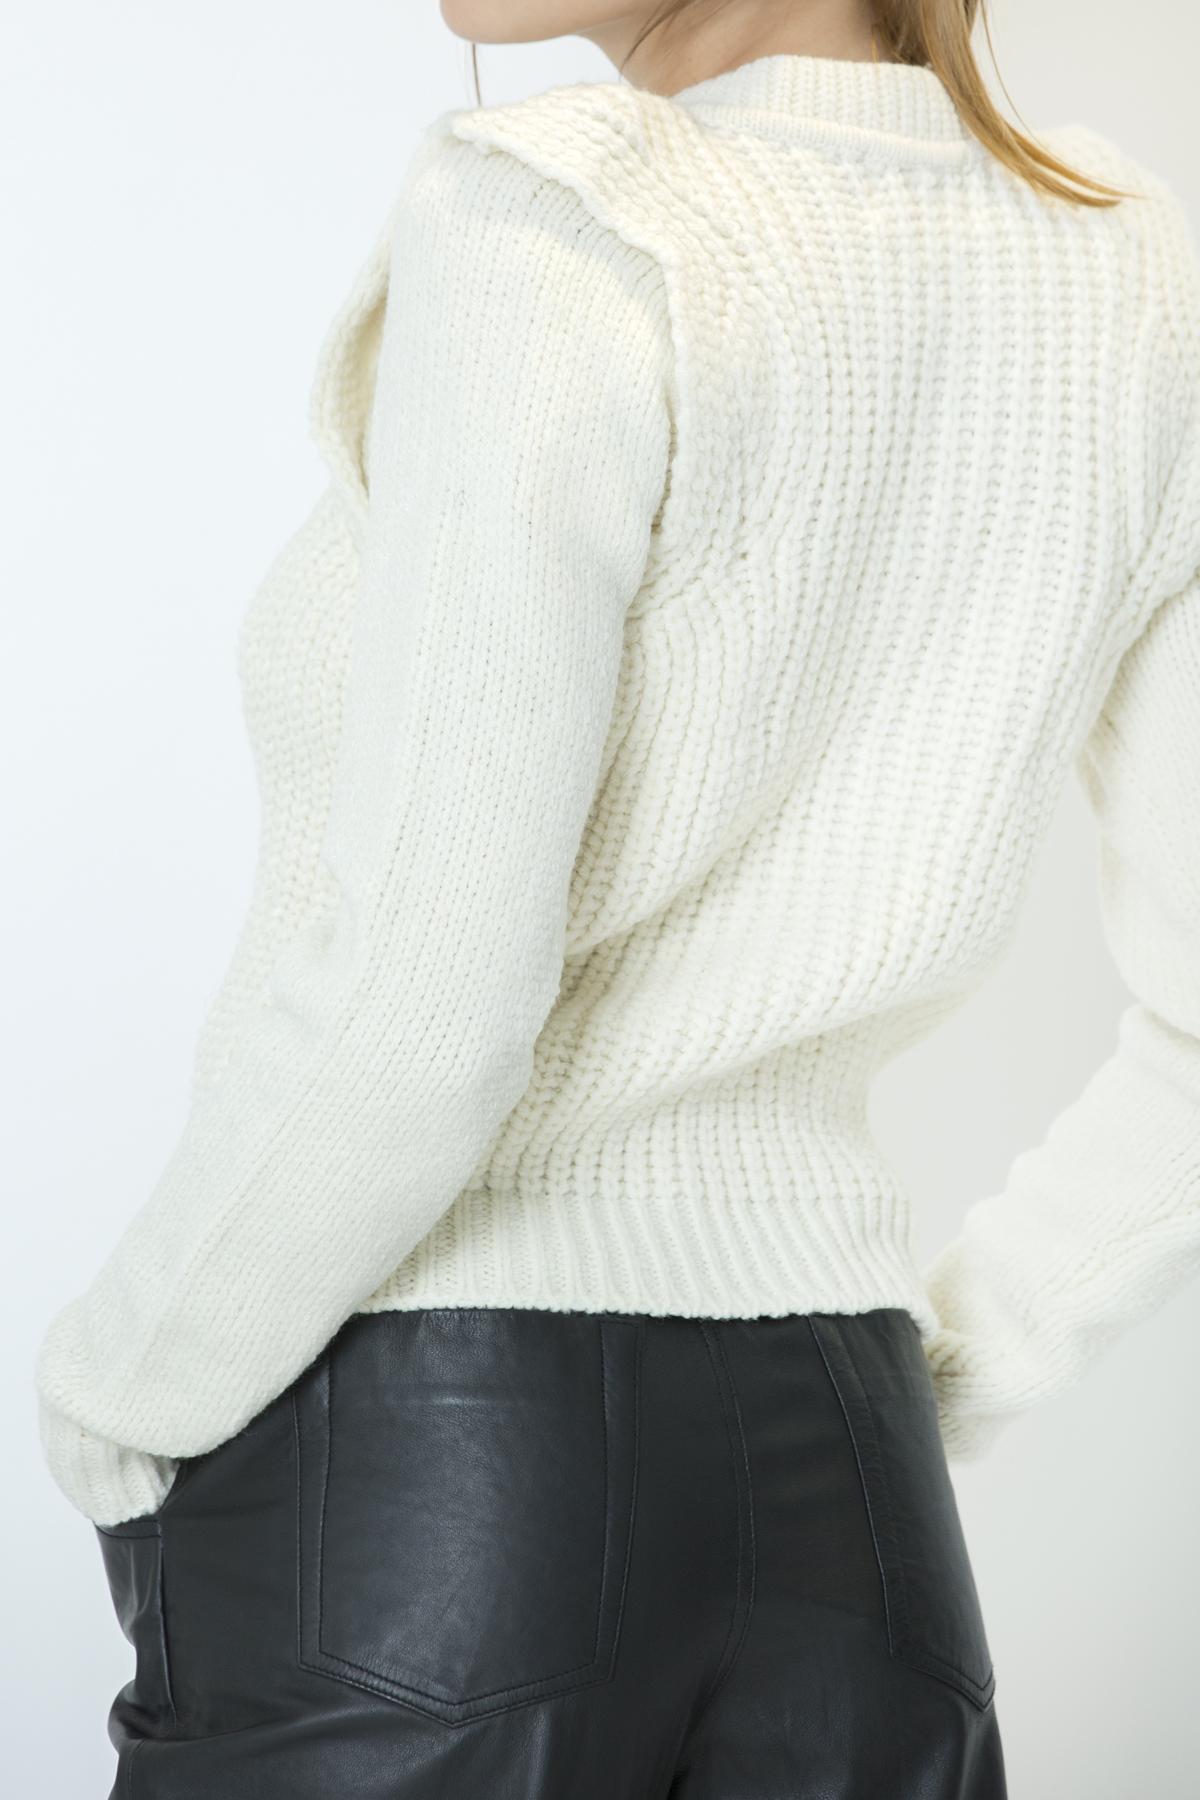 dennis-cardigan-pleats-knit-bash-matchboxathens